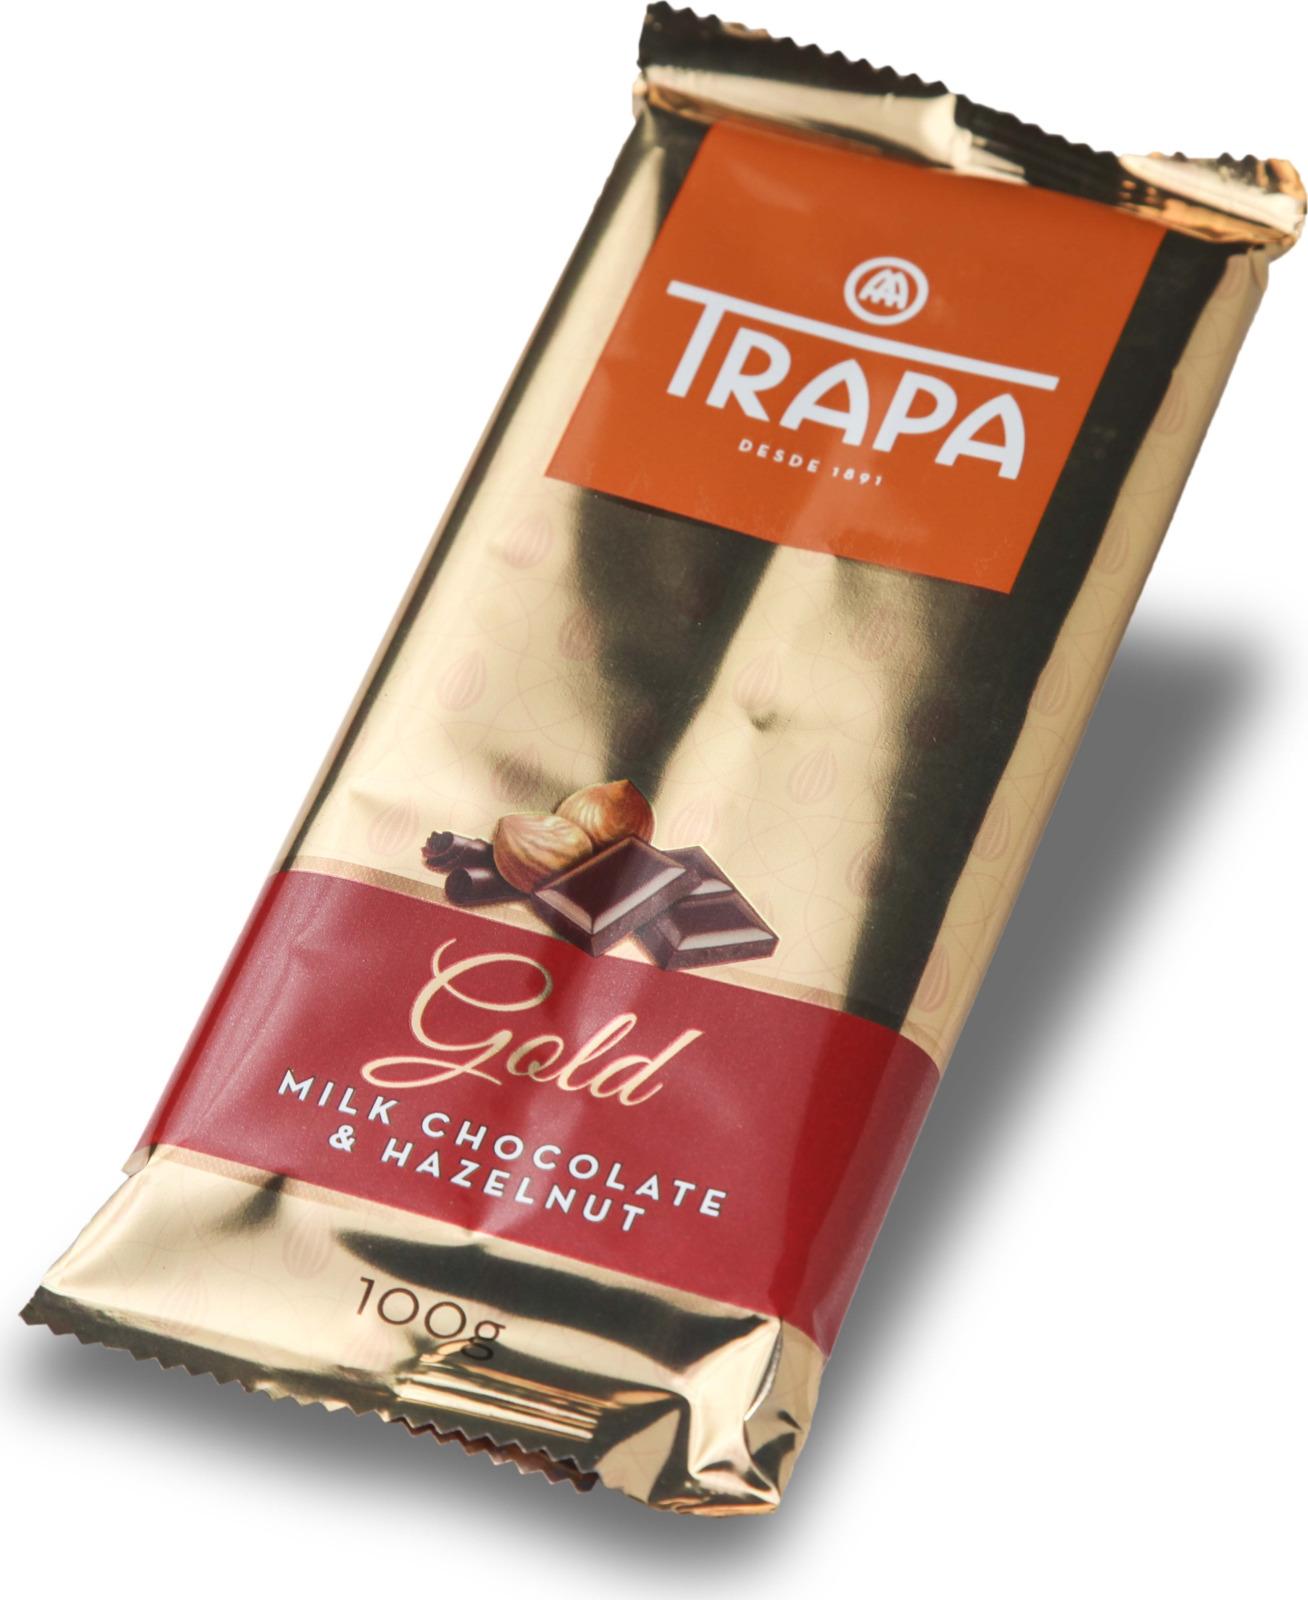 цена Молочный шоколад Trapa Gold Bar, с фундуком, 100 г онлайн в 2017 году